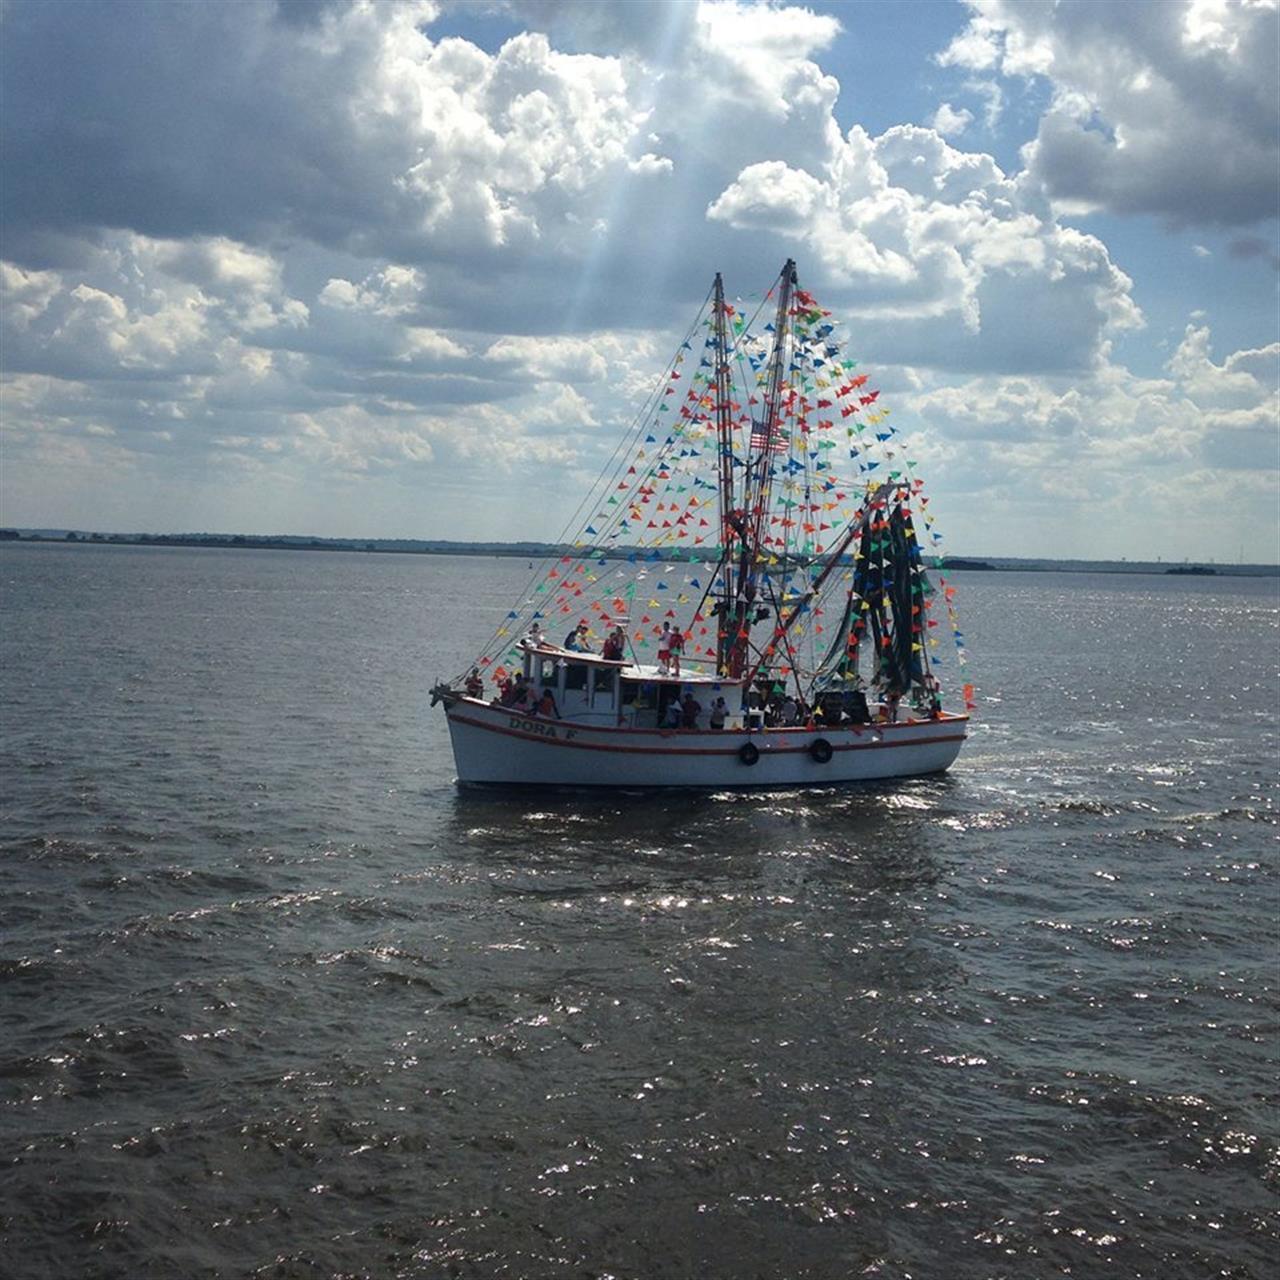 Brunswick Blessing of the Fleet 2015